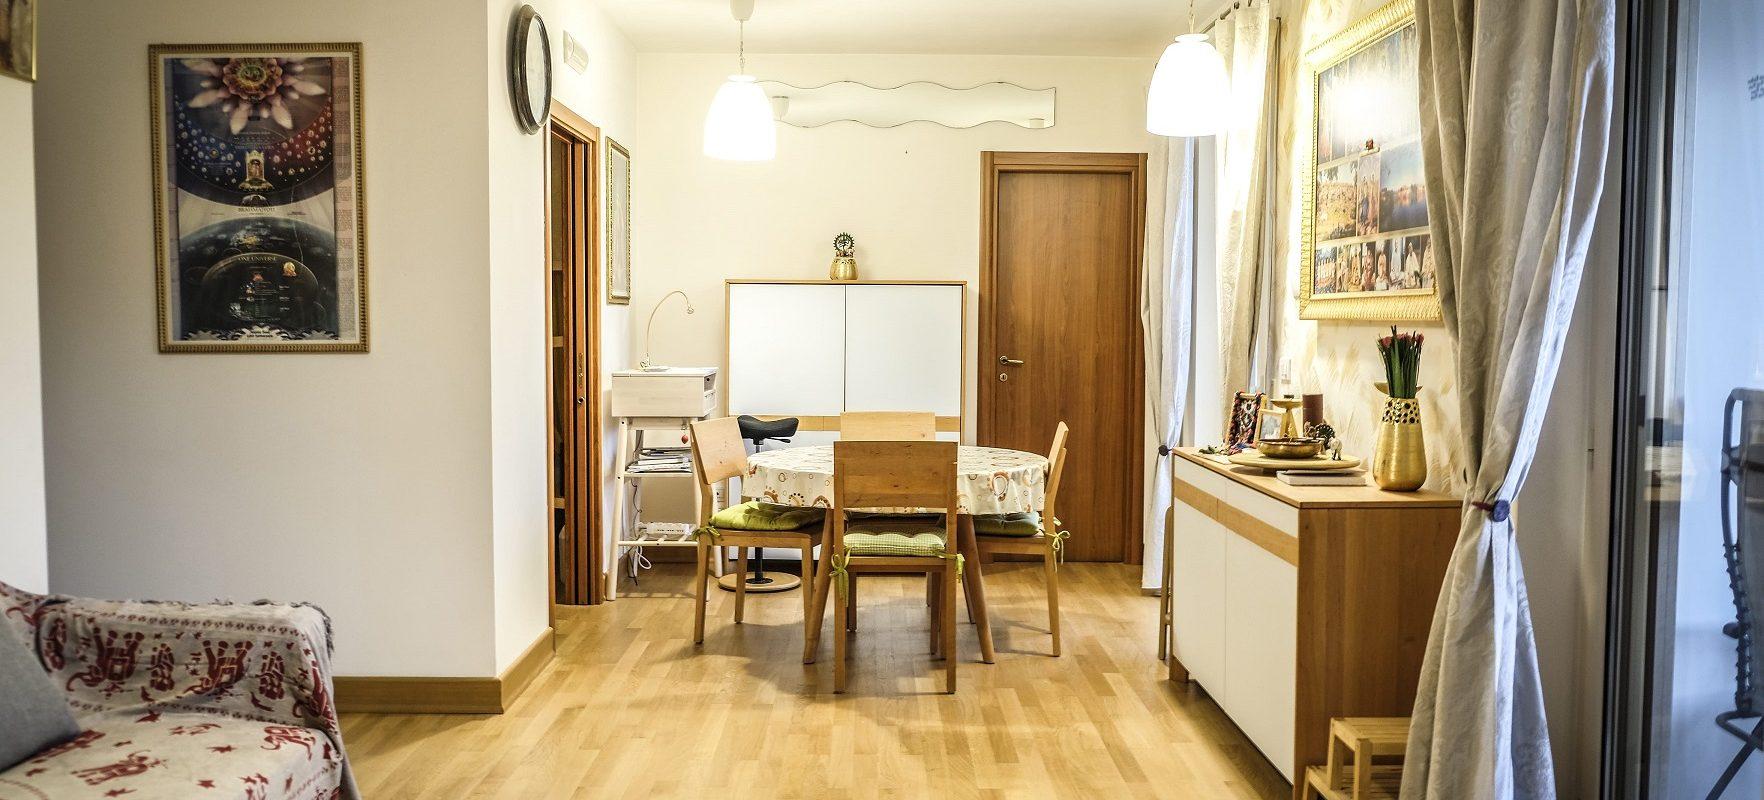 Appartamento 4 vani +doppi acc.